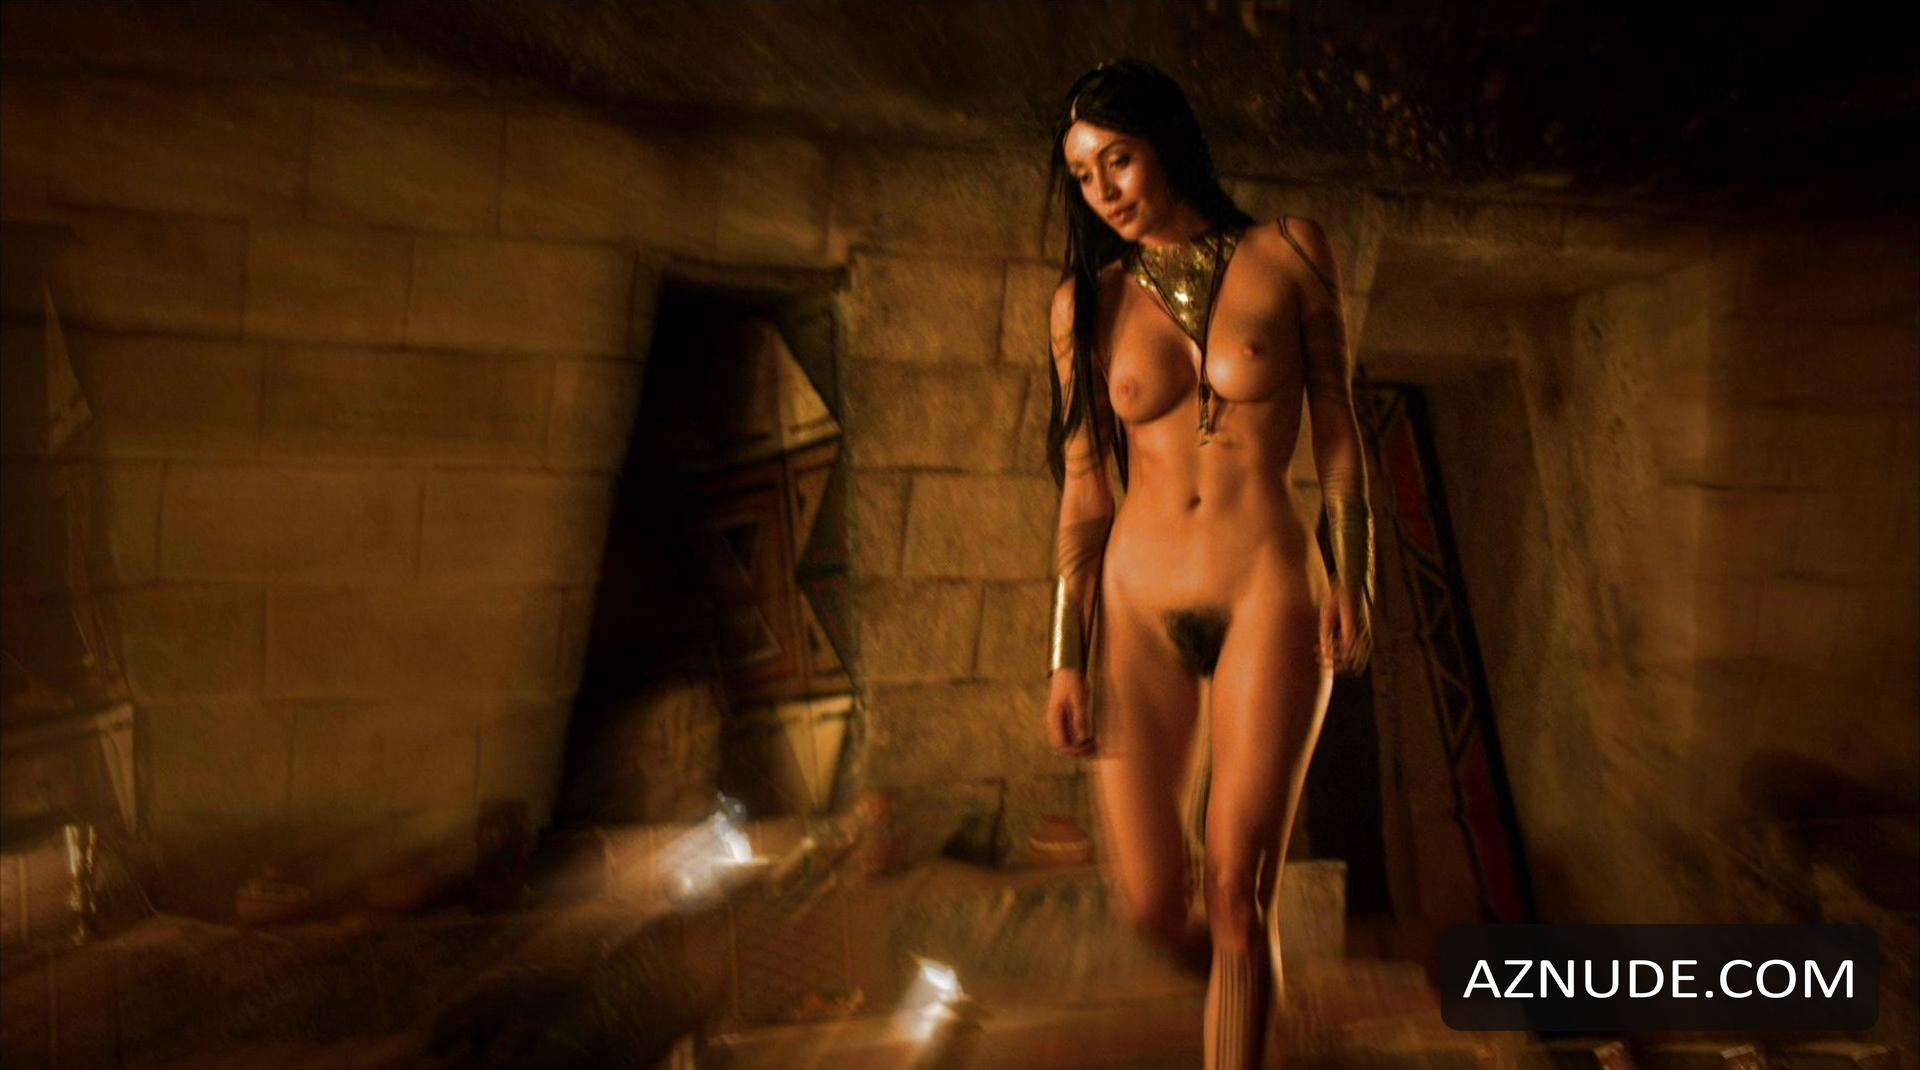 Sexygirlpornvideosdownload nude scenes